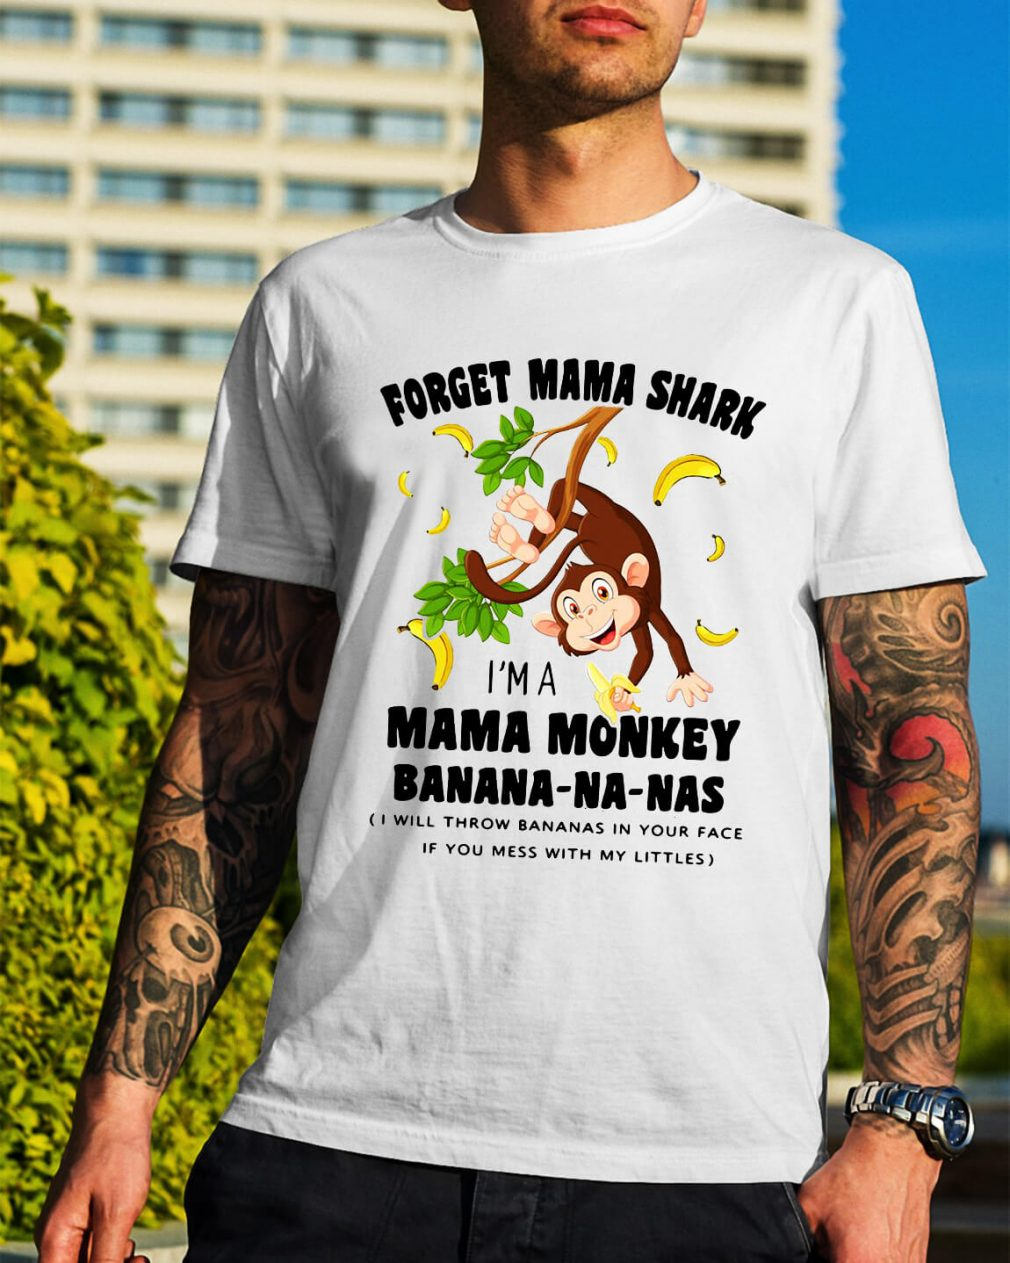 Forget Mama shark I'm a Mama monkey banana-na-nas shirt